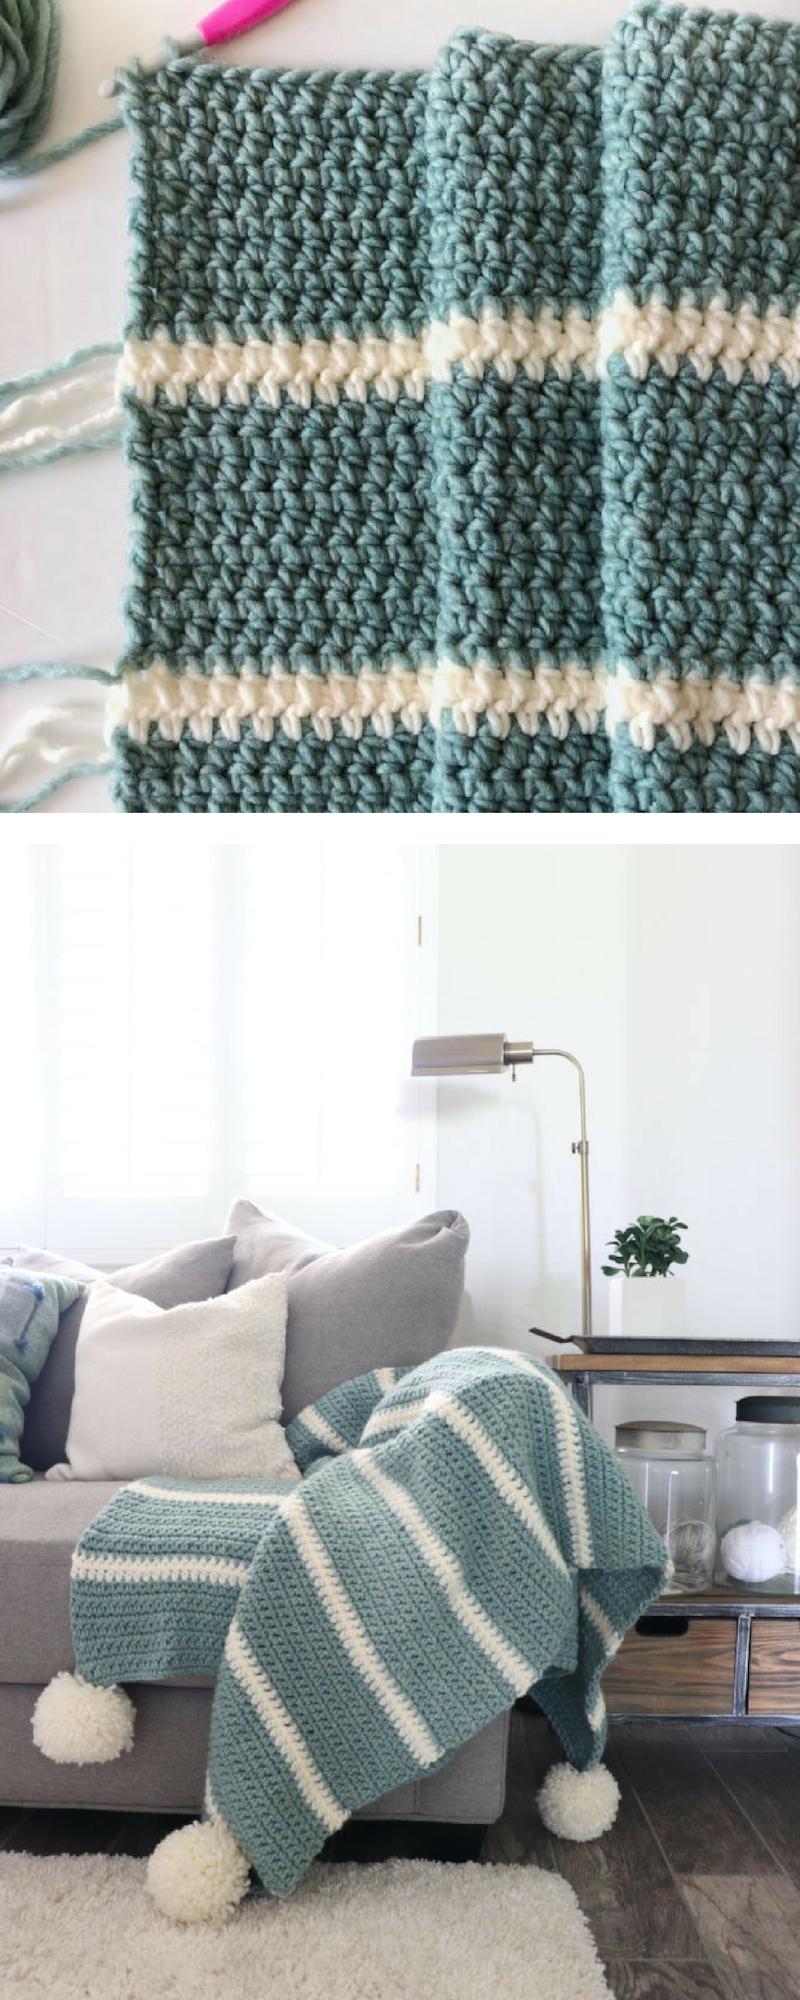 Free Pattern - Modern Low Tide Crochet Throw   Arts   CRAFTS ...